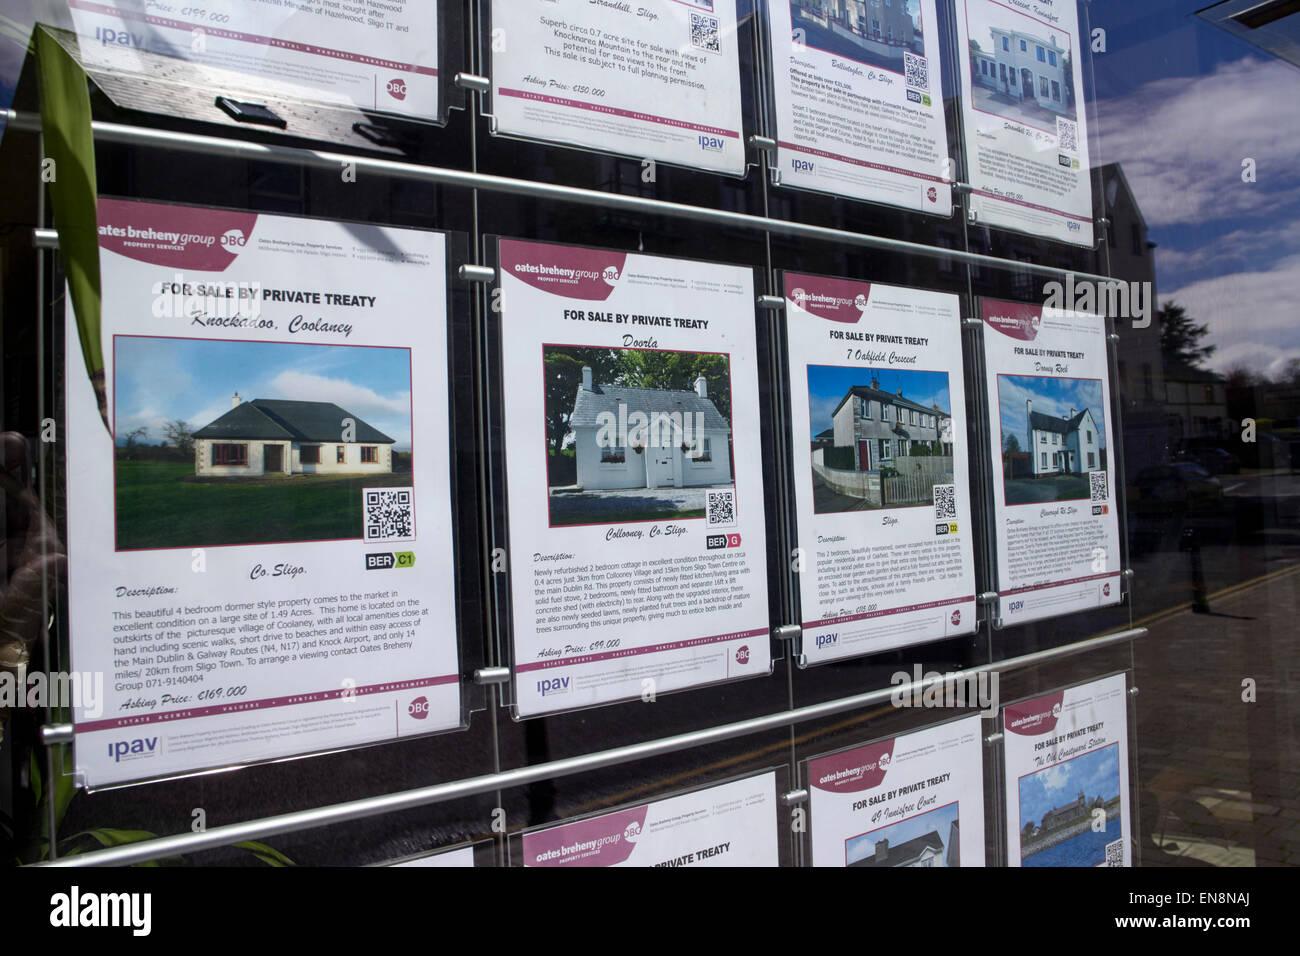 properties for sale in an estate agents window sligo republic of ireland - Stock Image